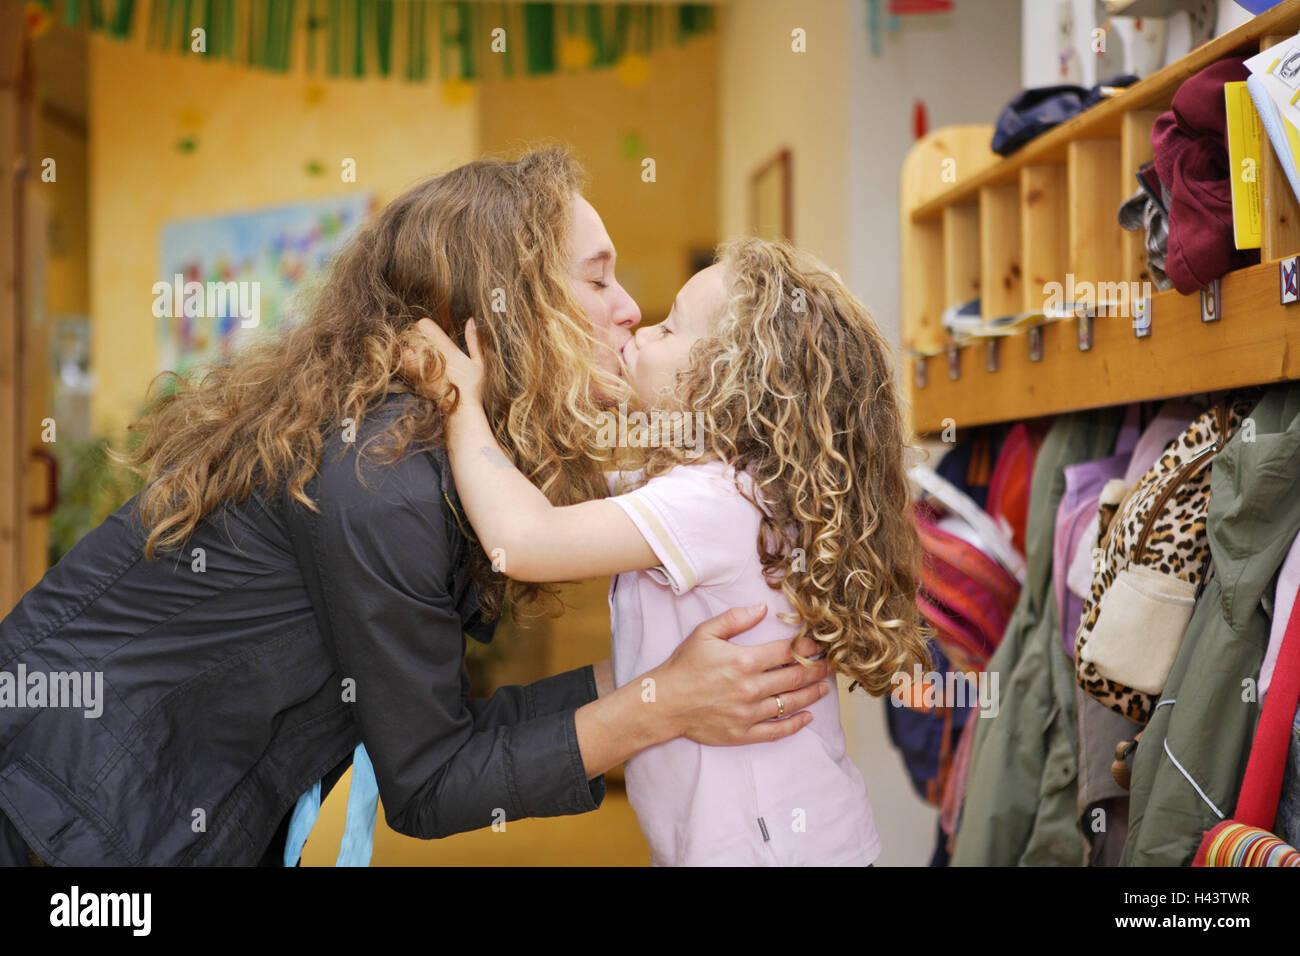 Kindergarten, mother, daughter, kiss, adoption, sidewise, people, woman, child, girl, kindergartner, blond, curls, - Stock Image